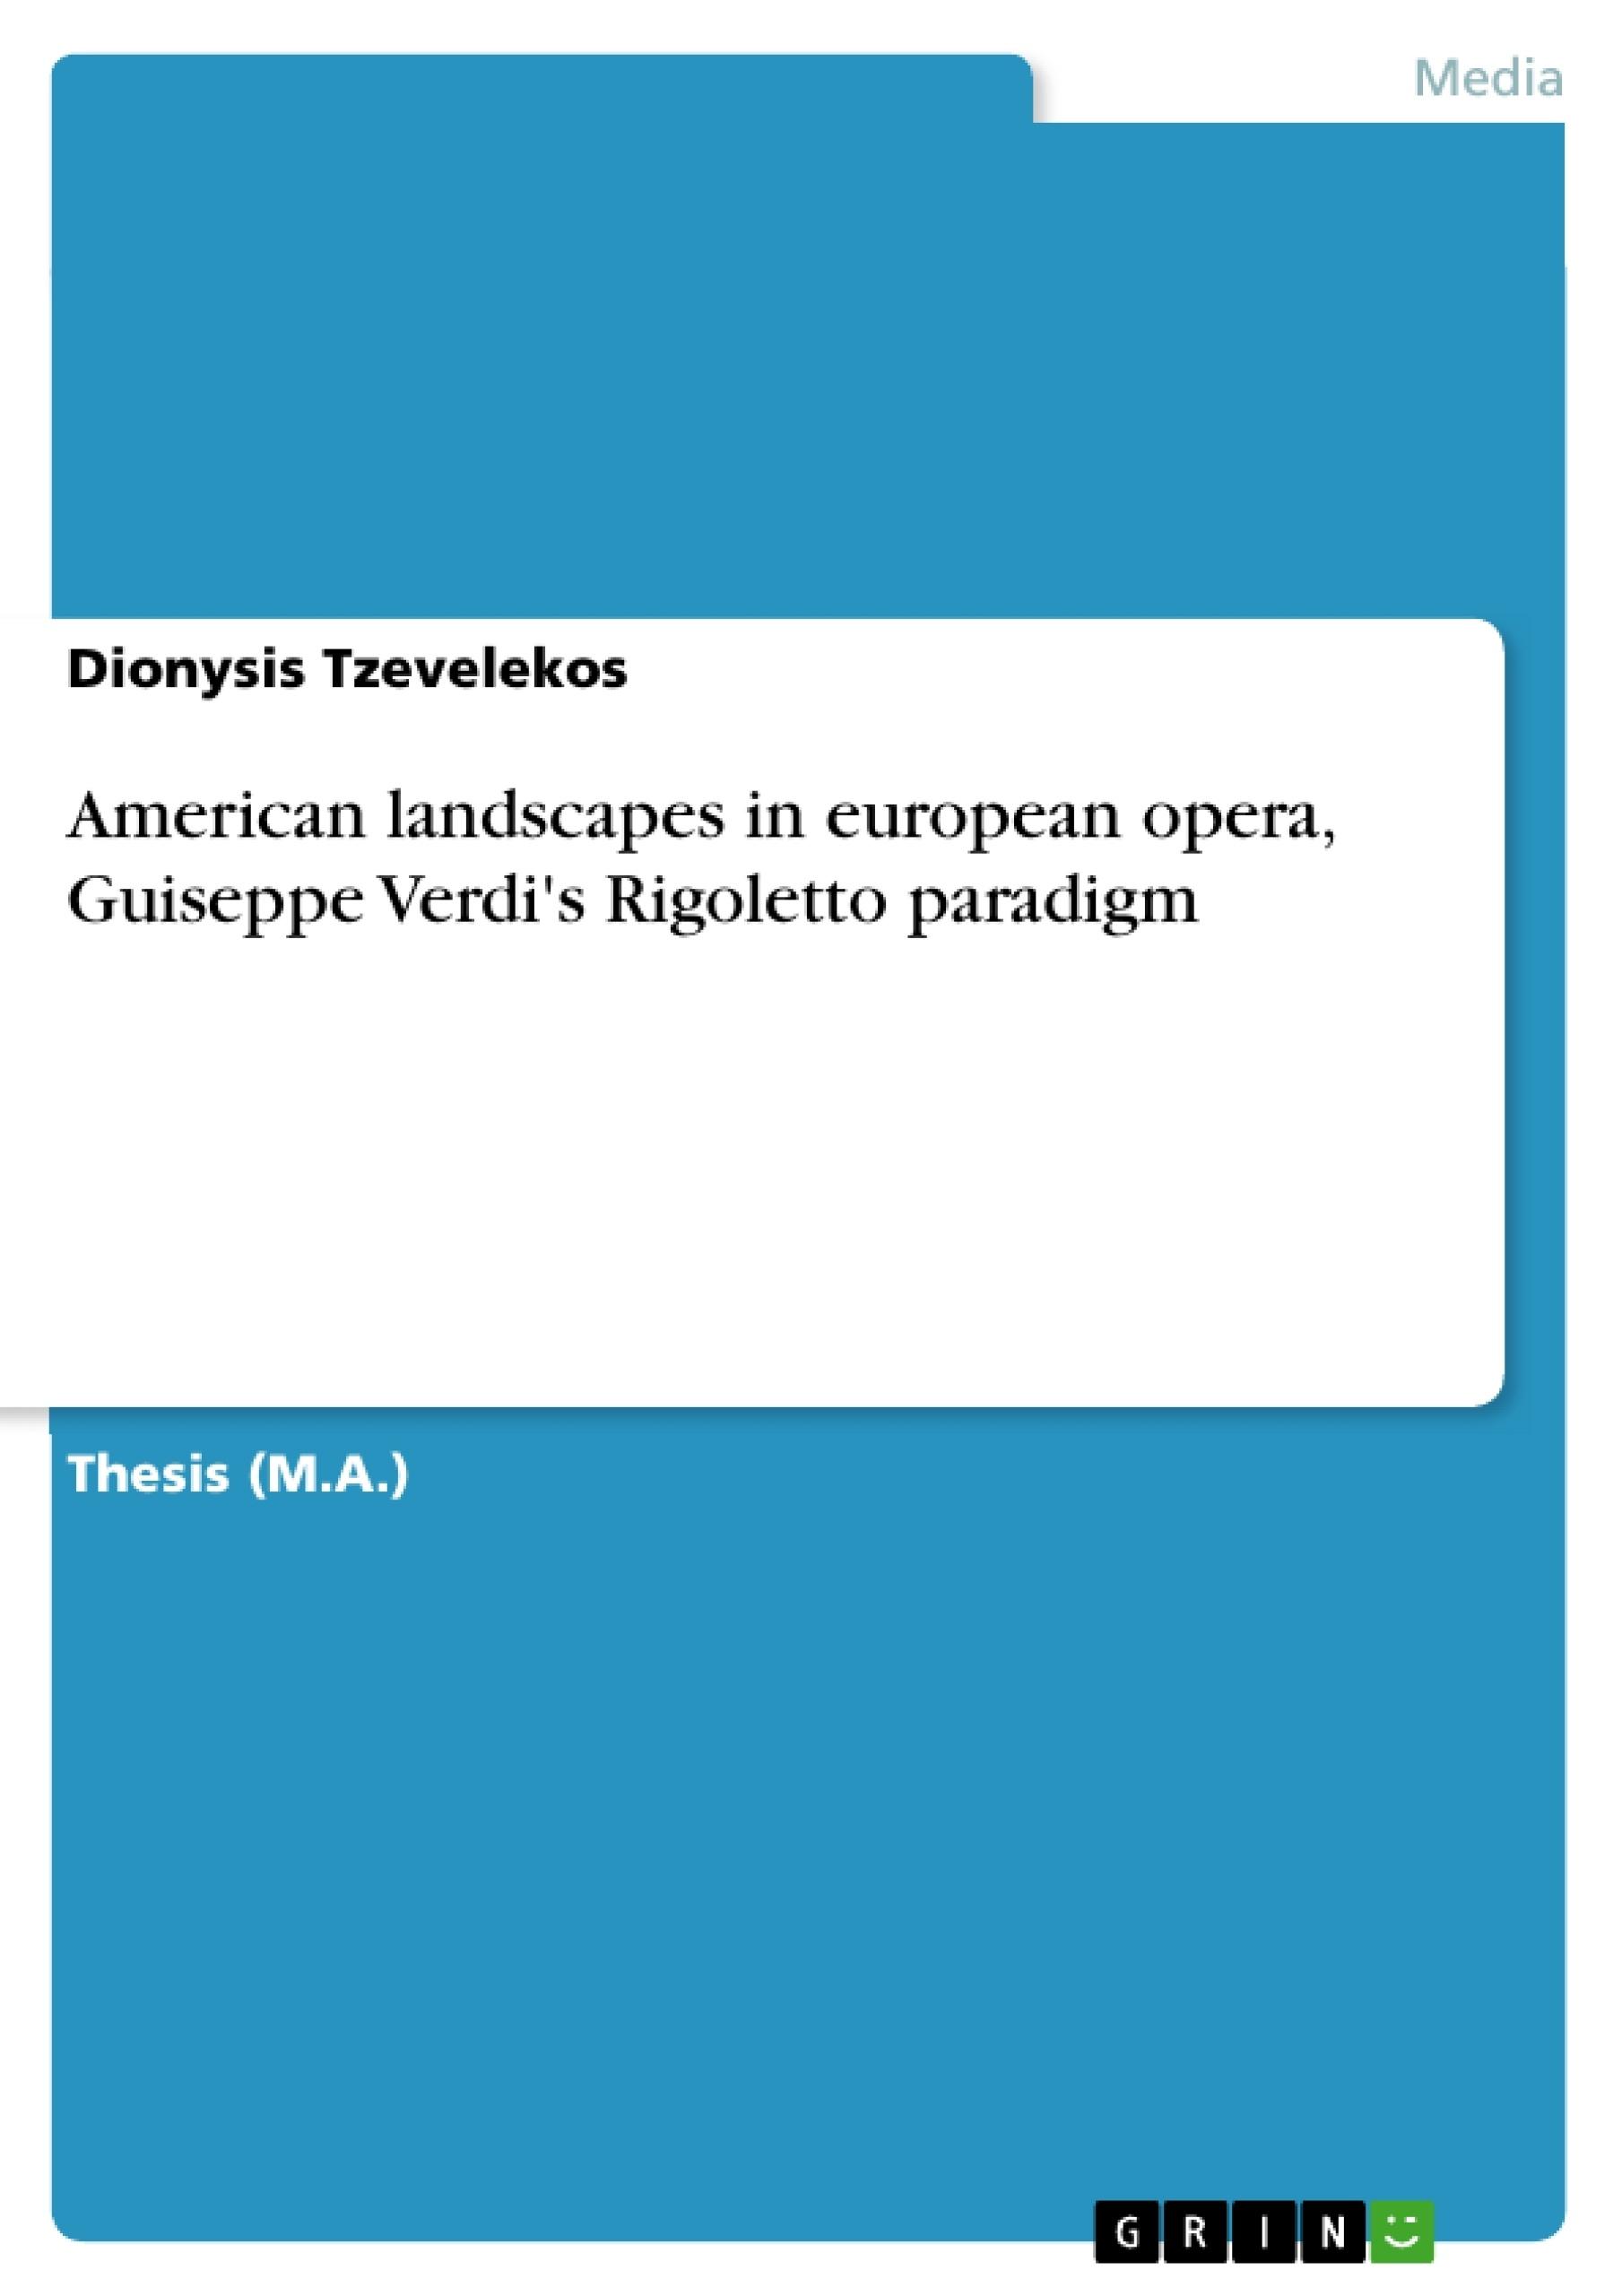 Title: American landscapes in european opera, Guiseppe Verdi's Rigoletto paradigm